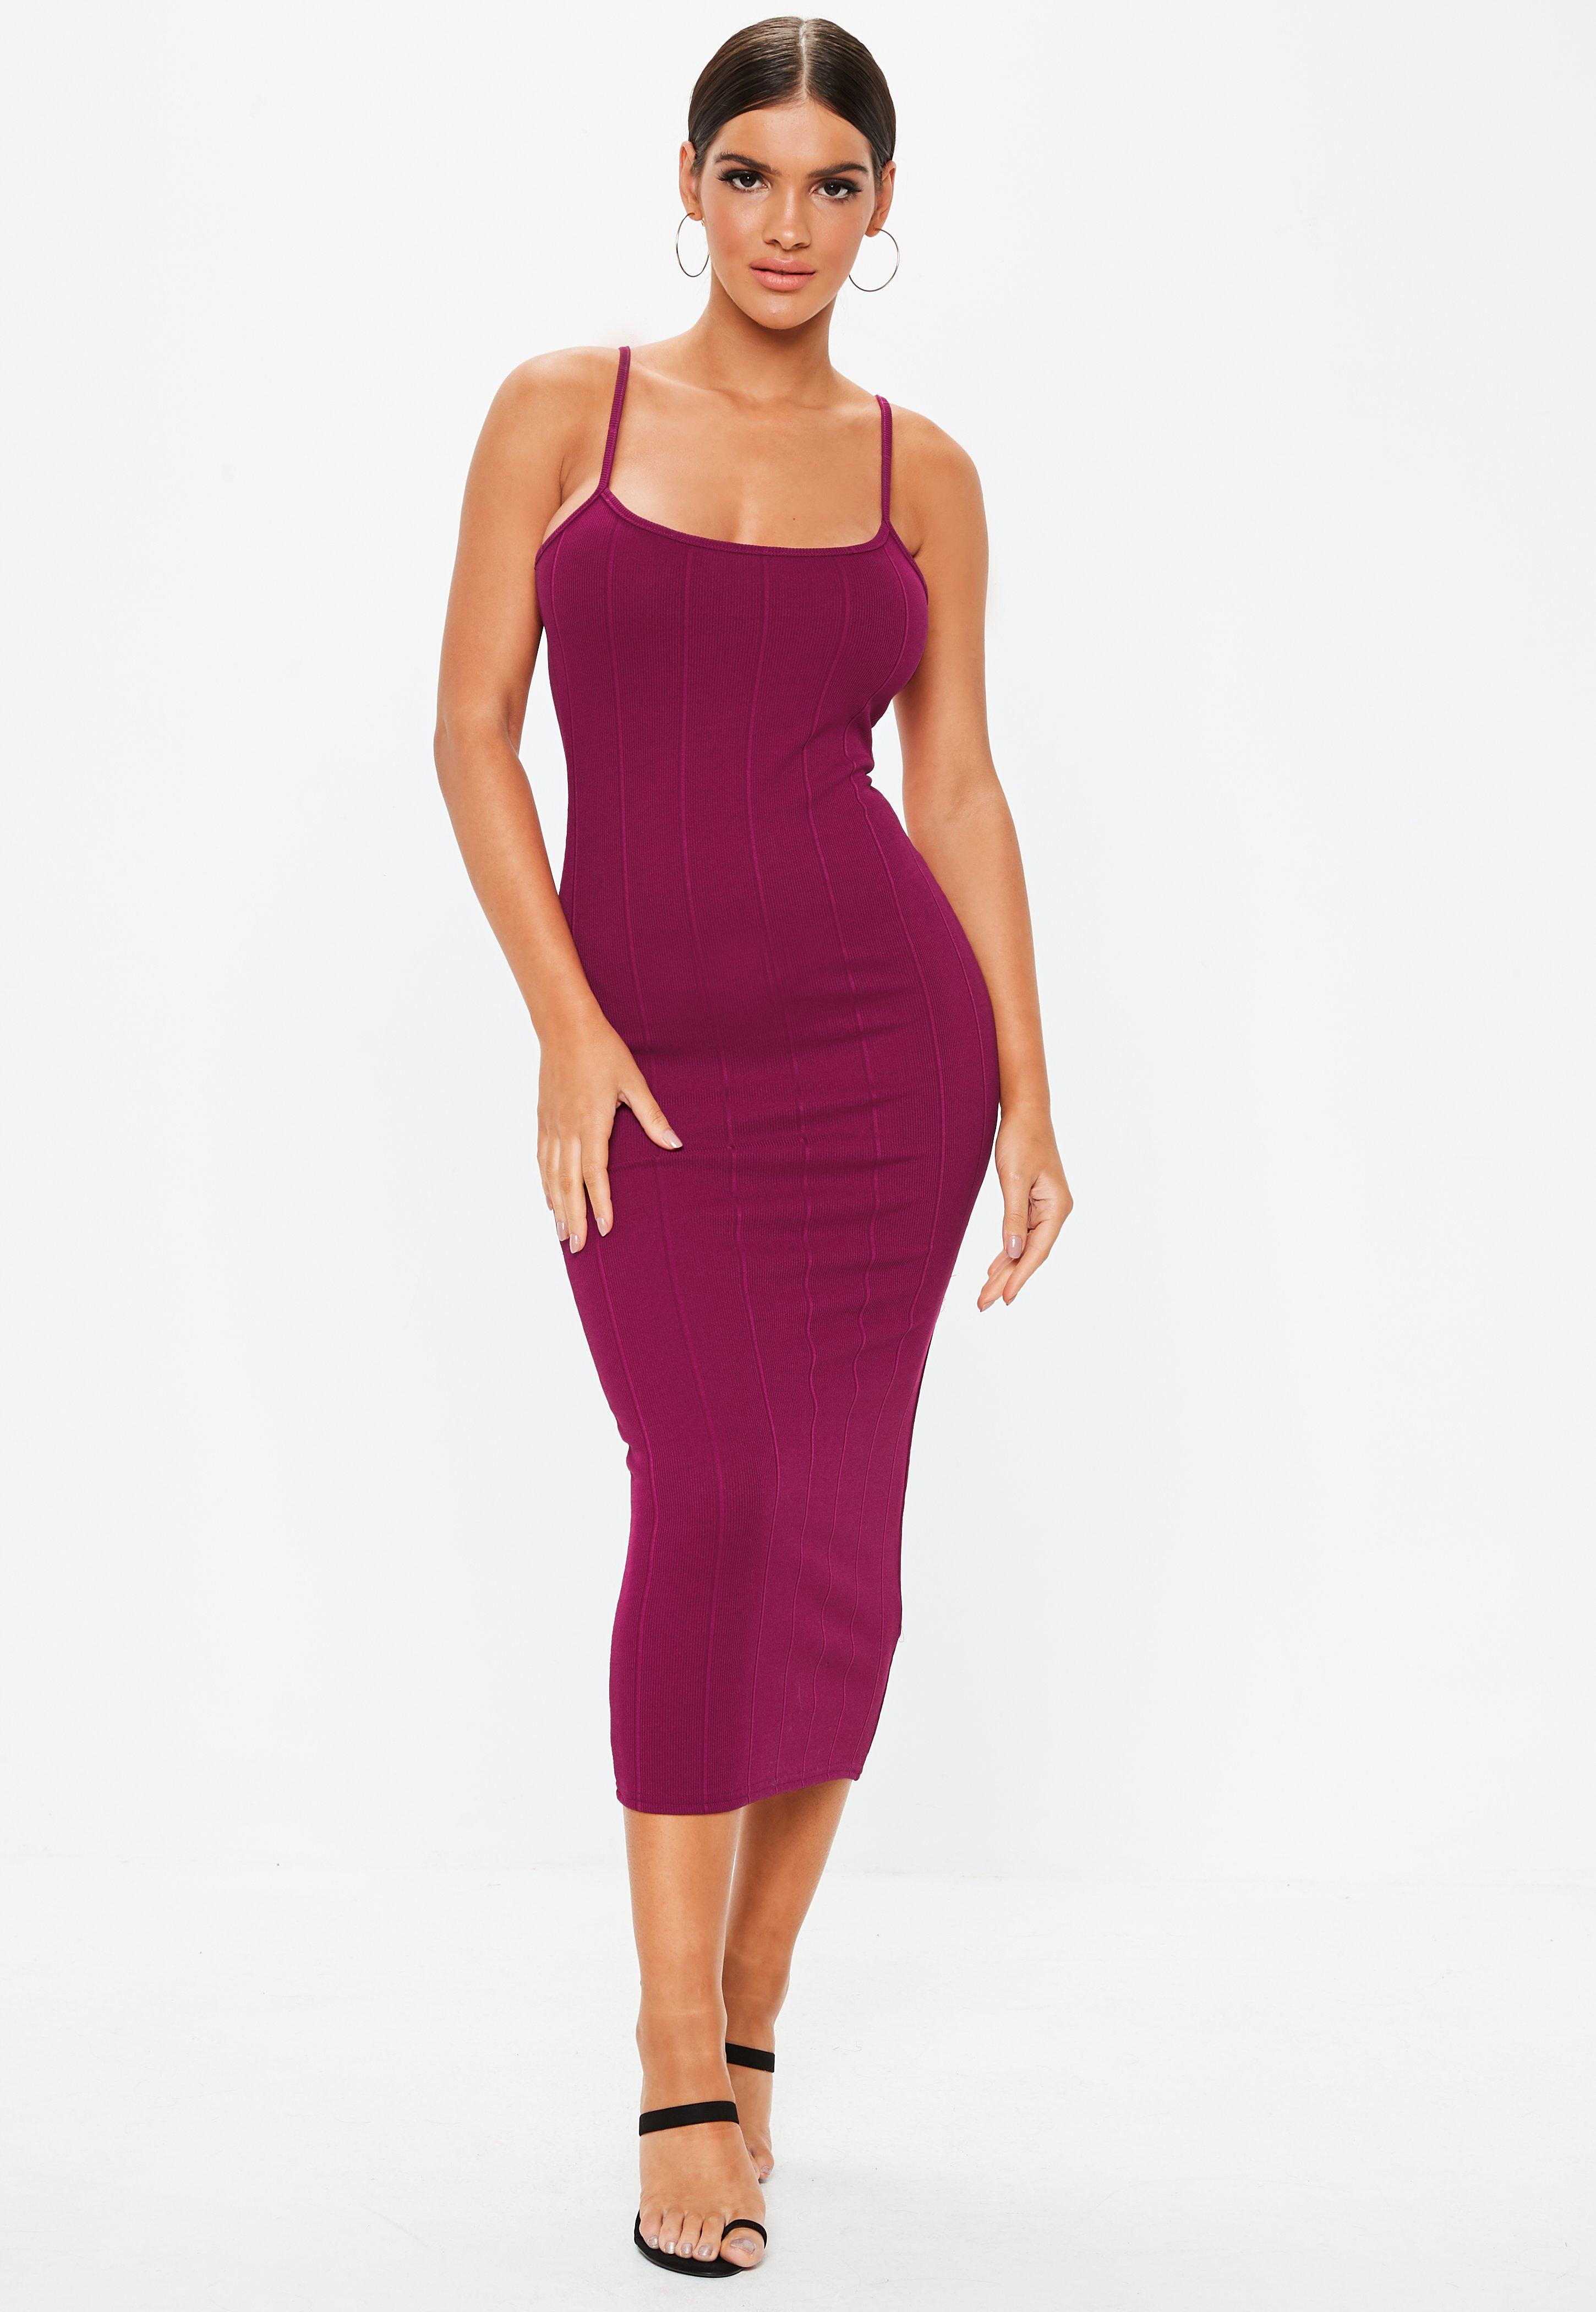 9e00c9d68fceab Missguided Purple Scoop Neck Strappy Bandage Midi Dress in Purple - Lyst